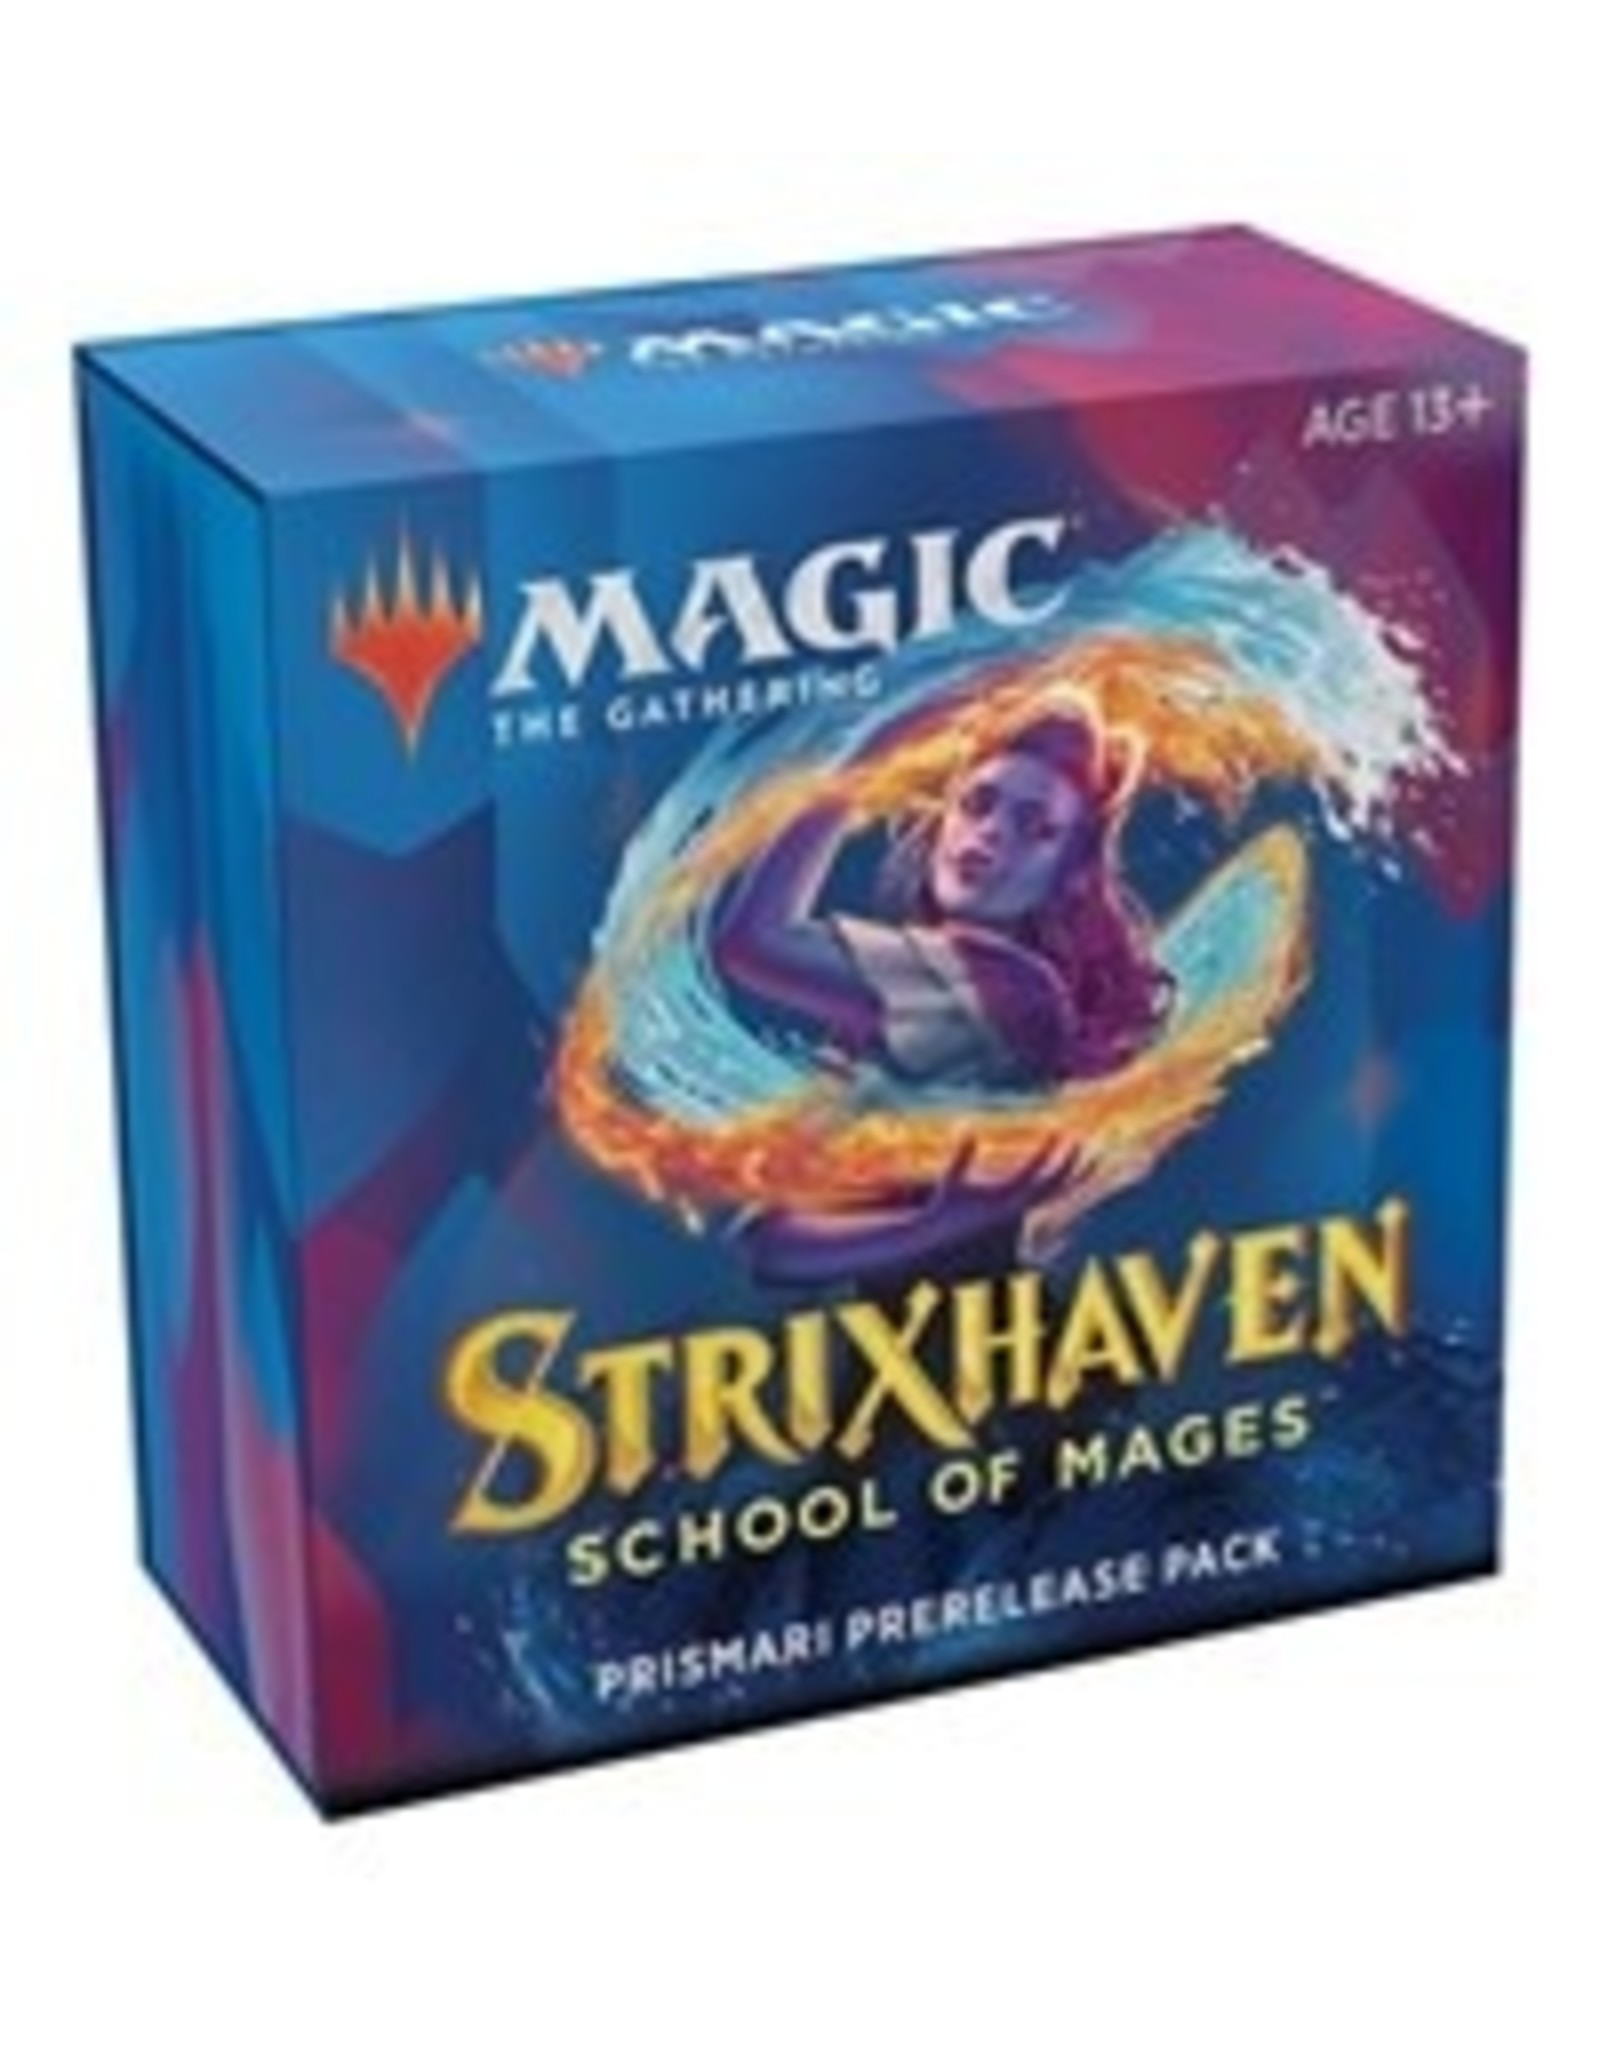 Magic Strixhaven: School of Mages - Prerelease Pack [Prismari]